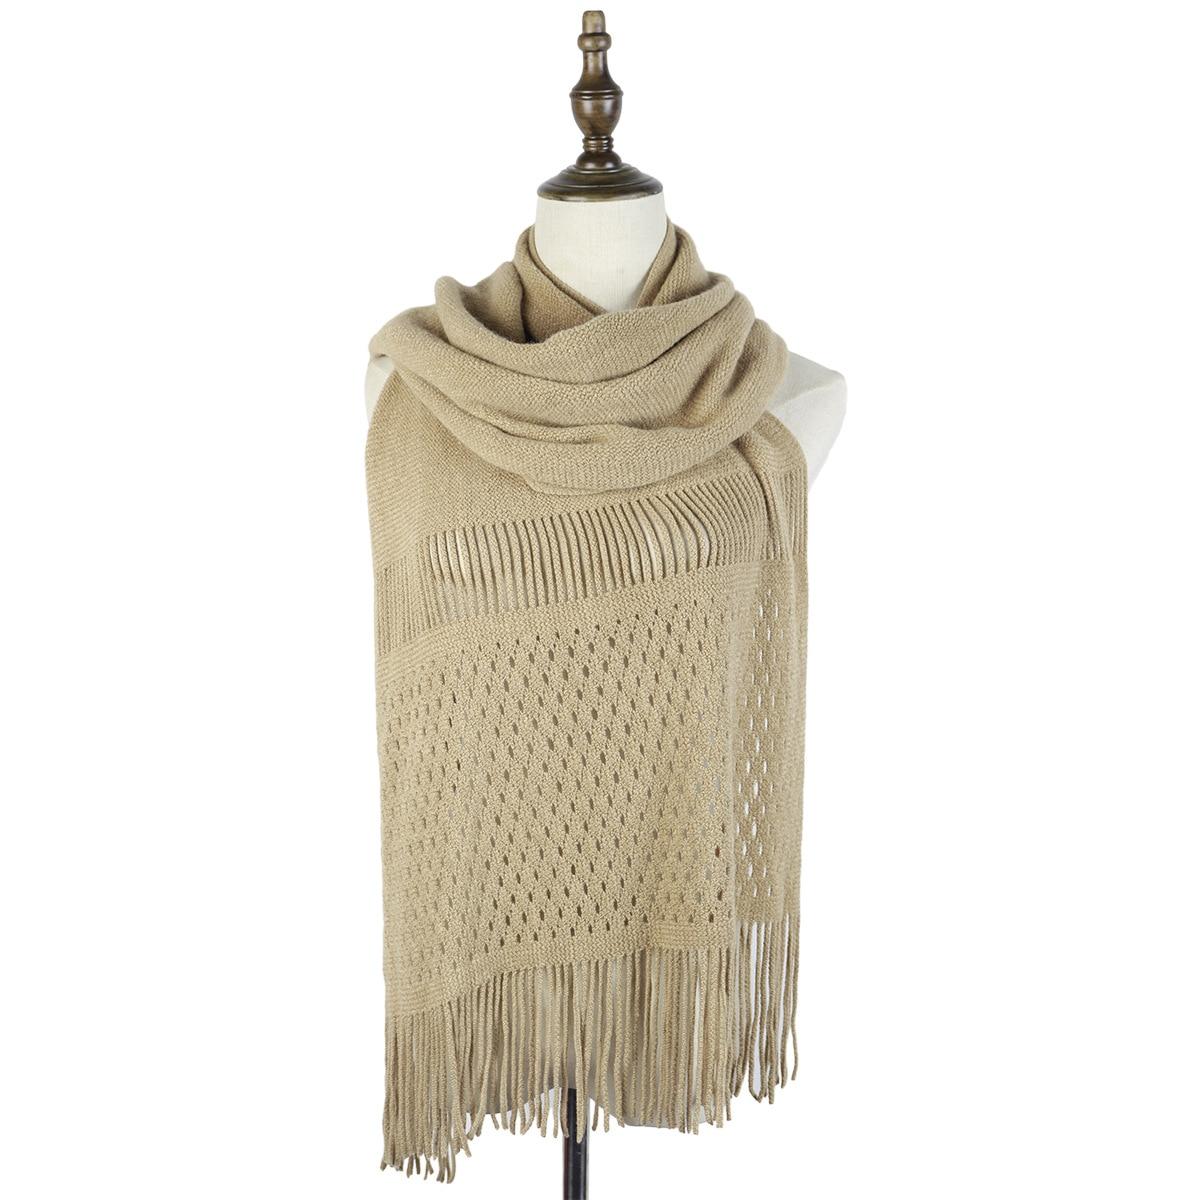 soft knit scarfs fashion women winter wraps shawls jacquard stoles capes tassels elastic soft material luxury scarfs ladies